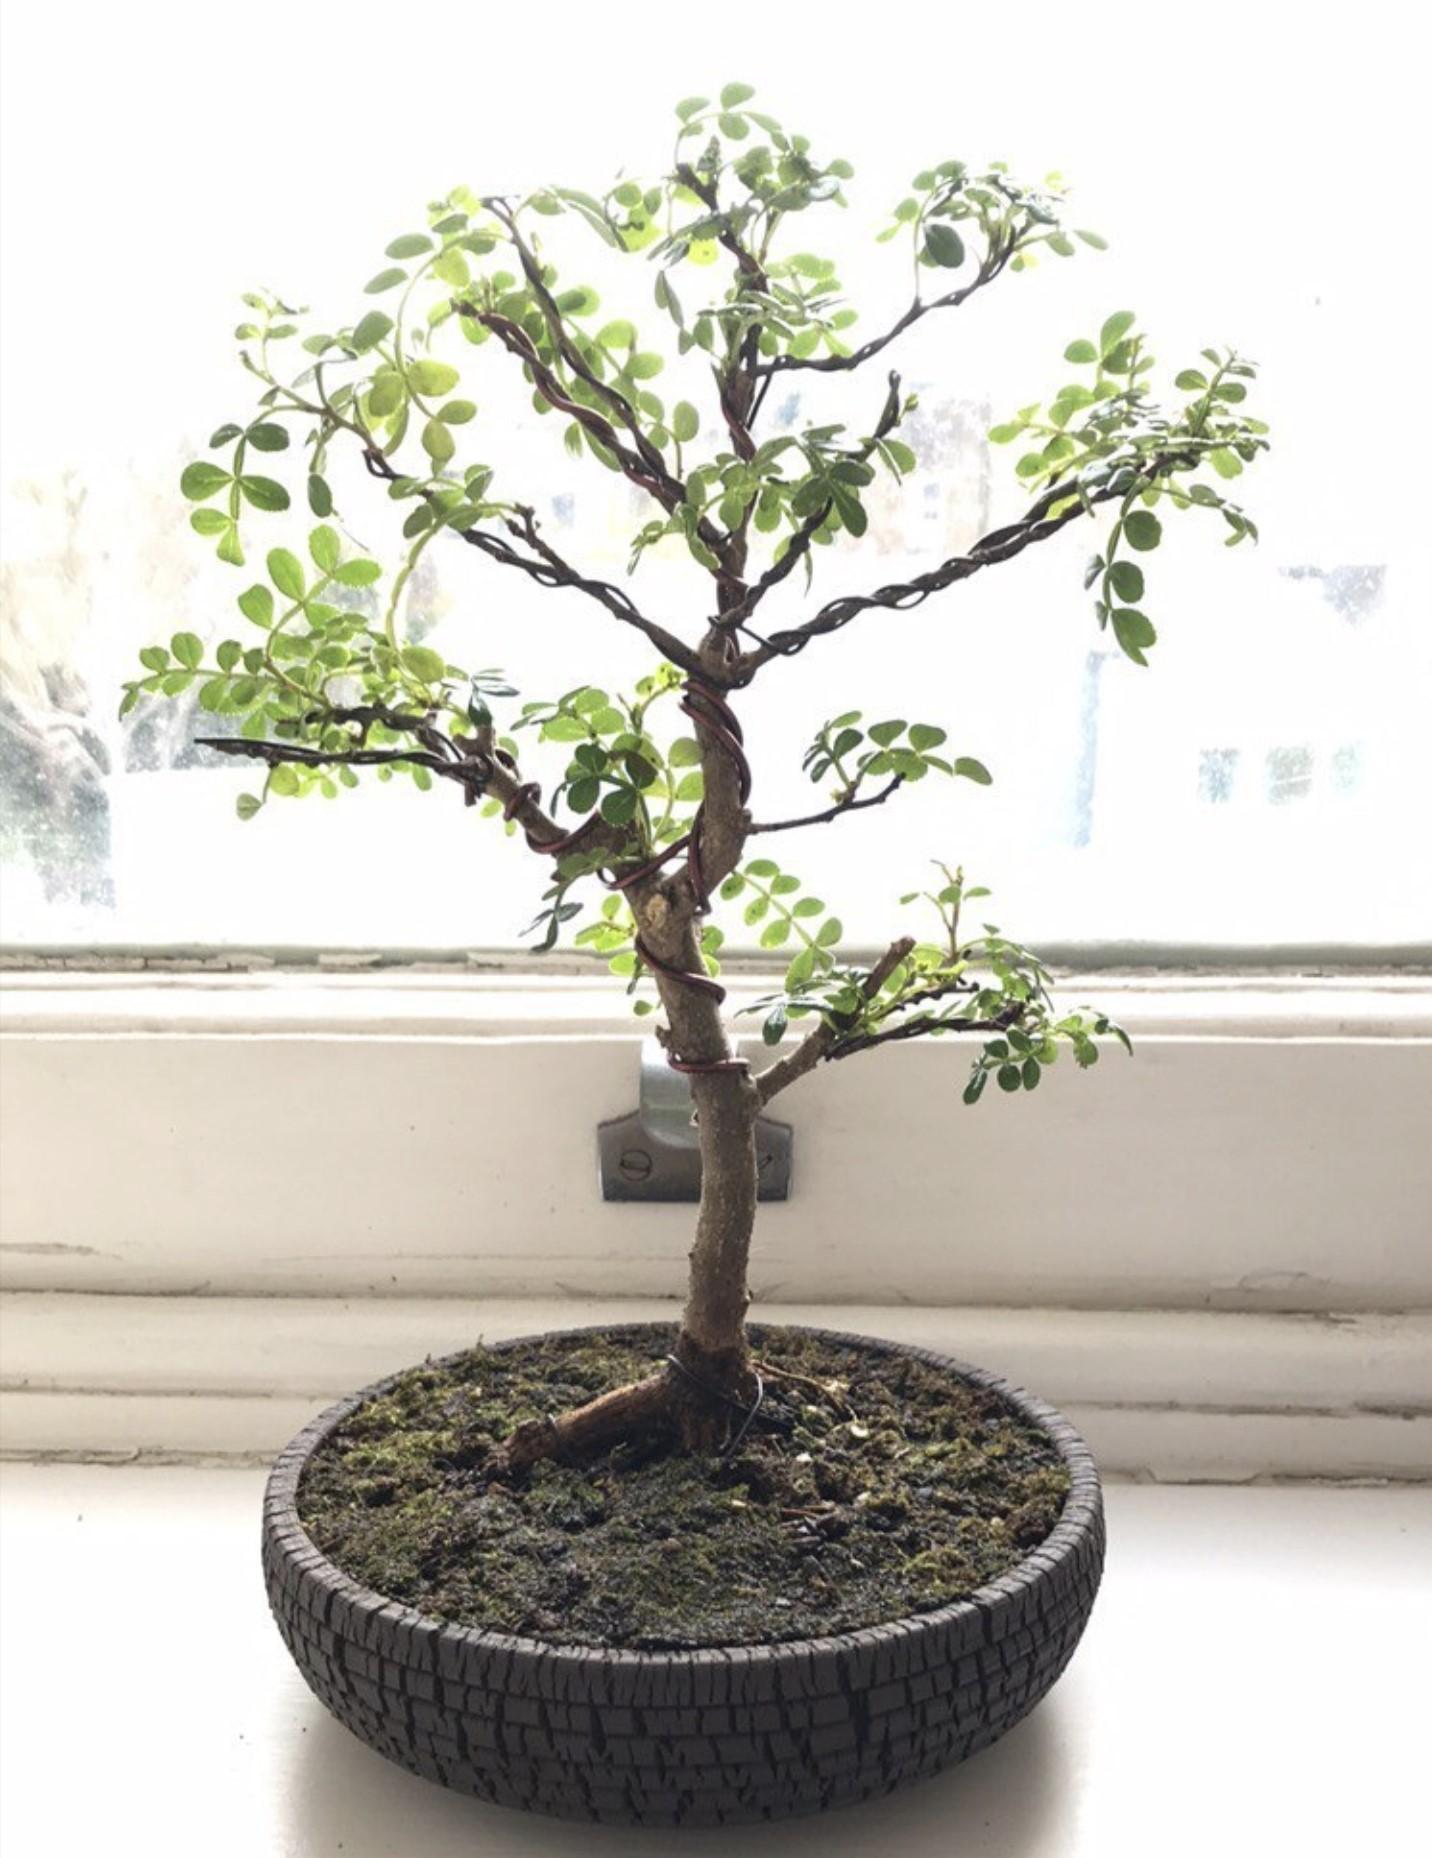 Lachlan's tree